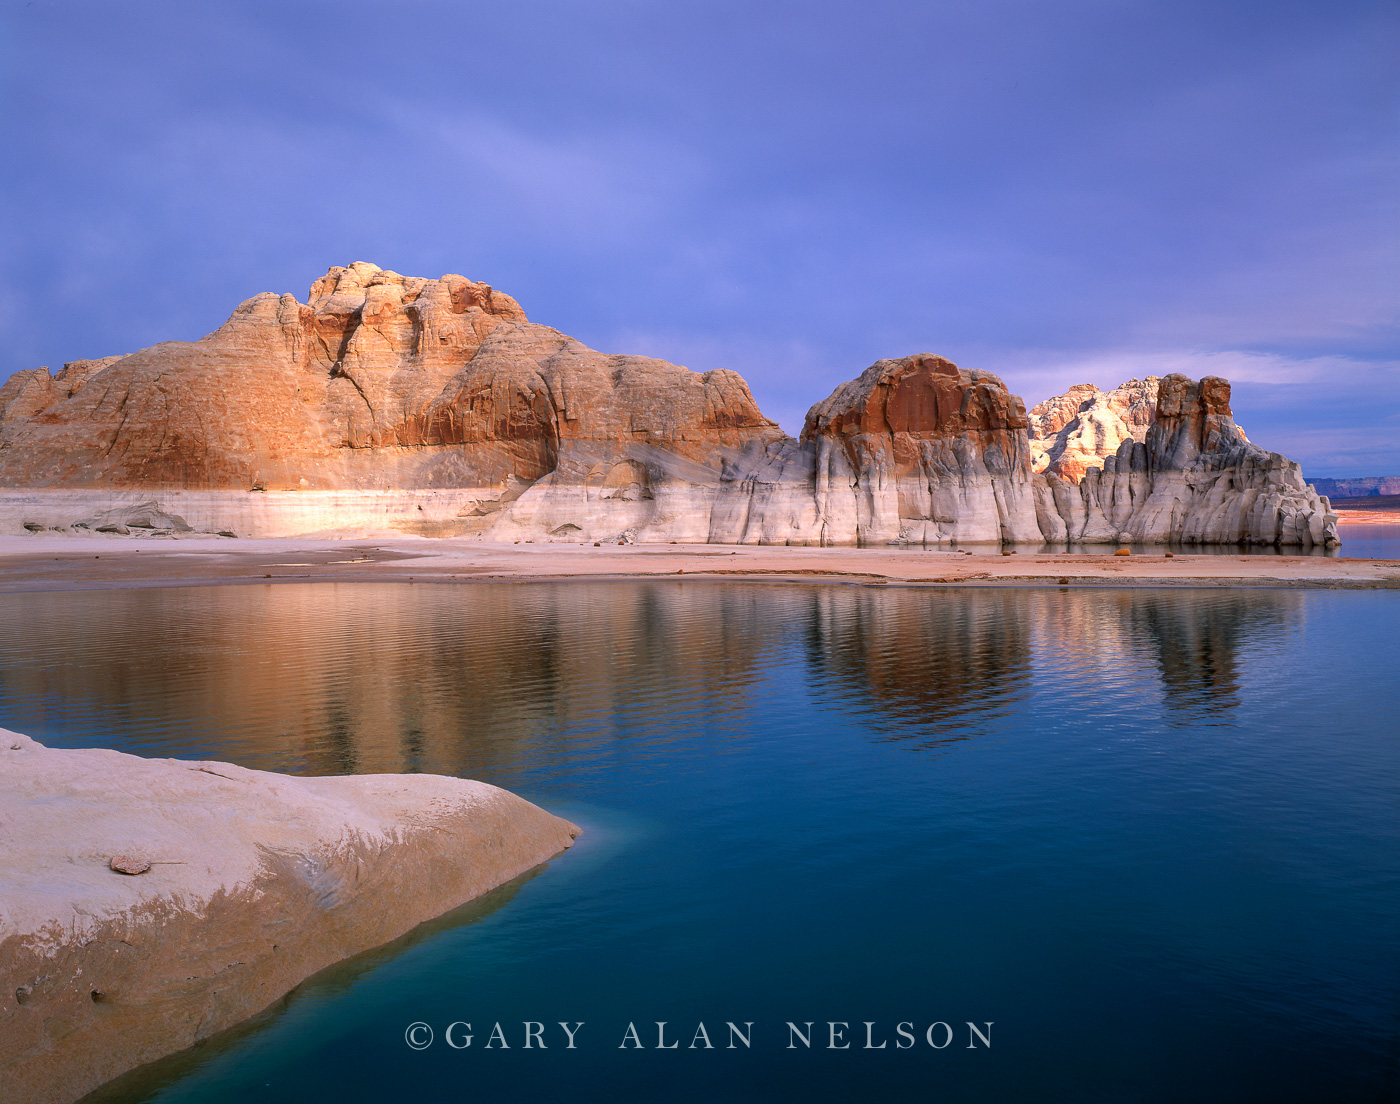 Glen Canyon National Recreation Area, Utah, lake powell, wahweap bay, photo